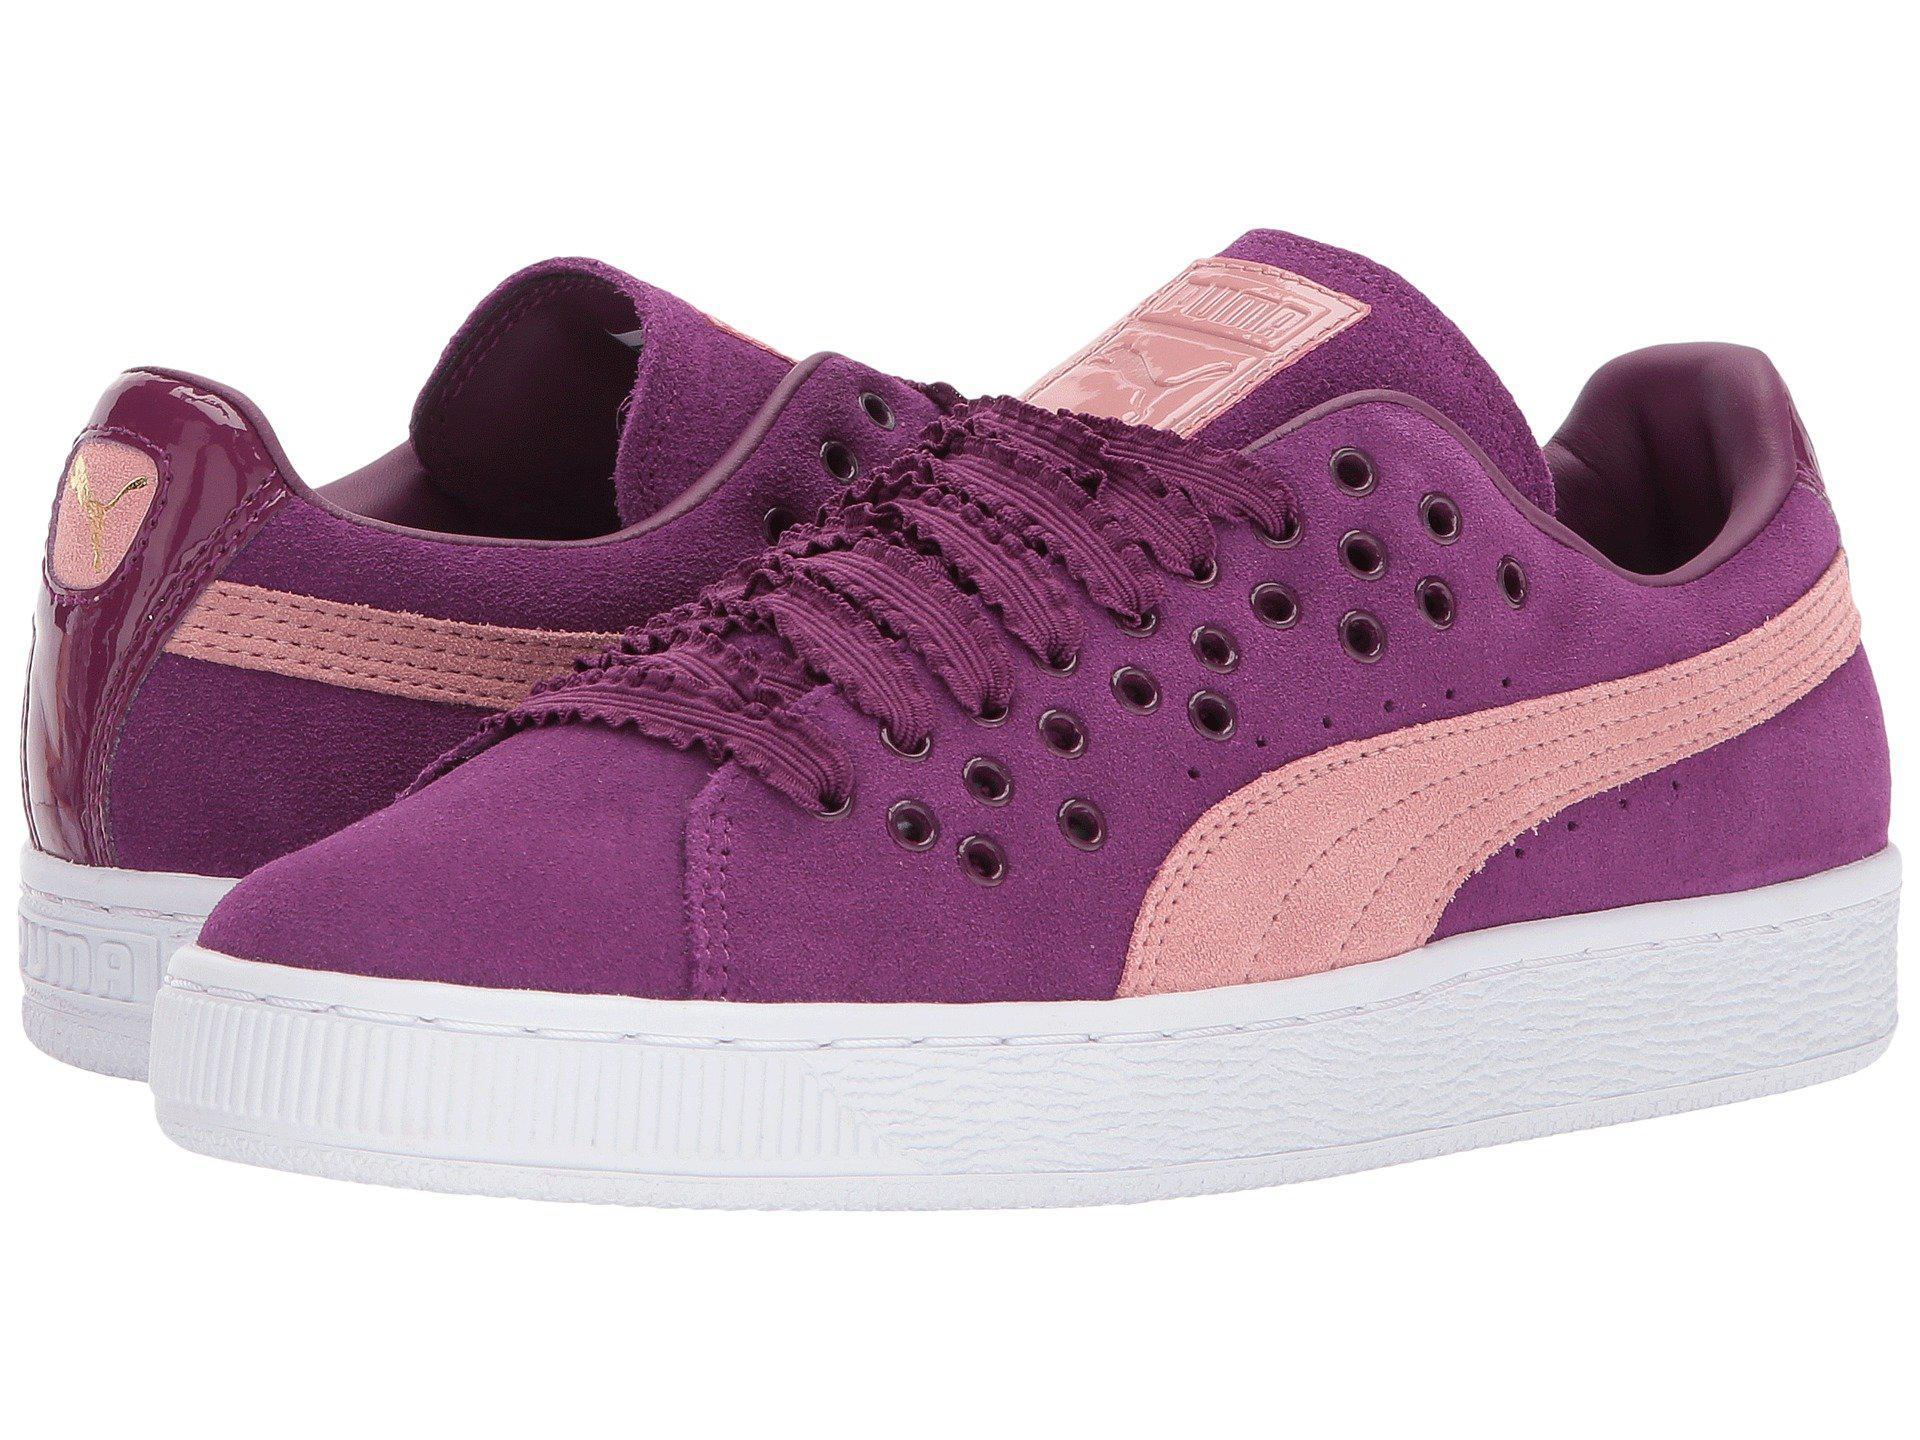 73ac27460 Lyst - PUMA Suede Xl Lace in Purple - Save 56.45161290322581%